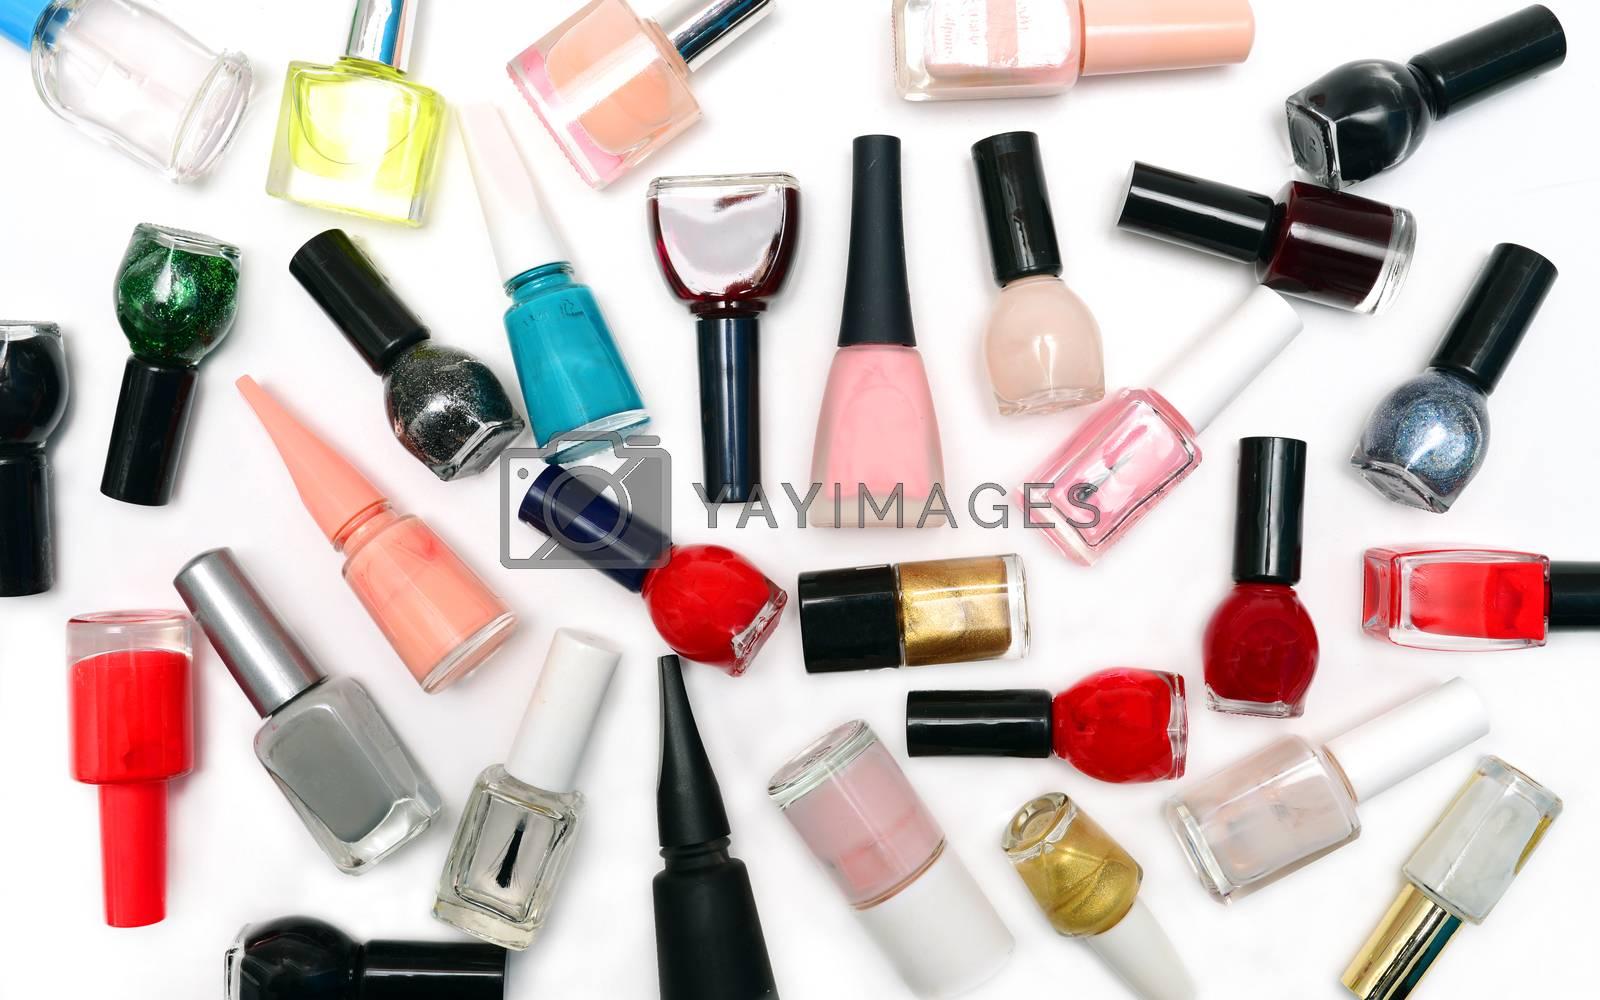 nail polish bottles pattern background over white